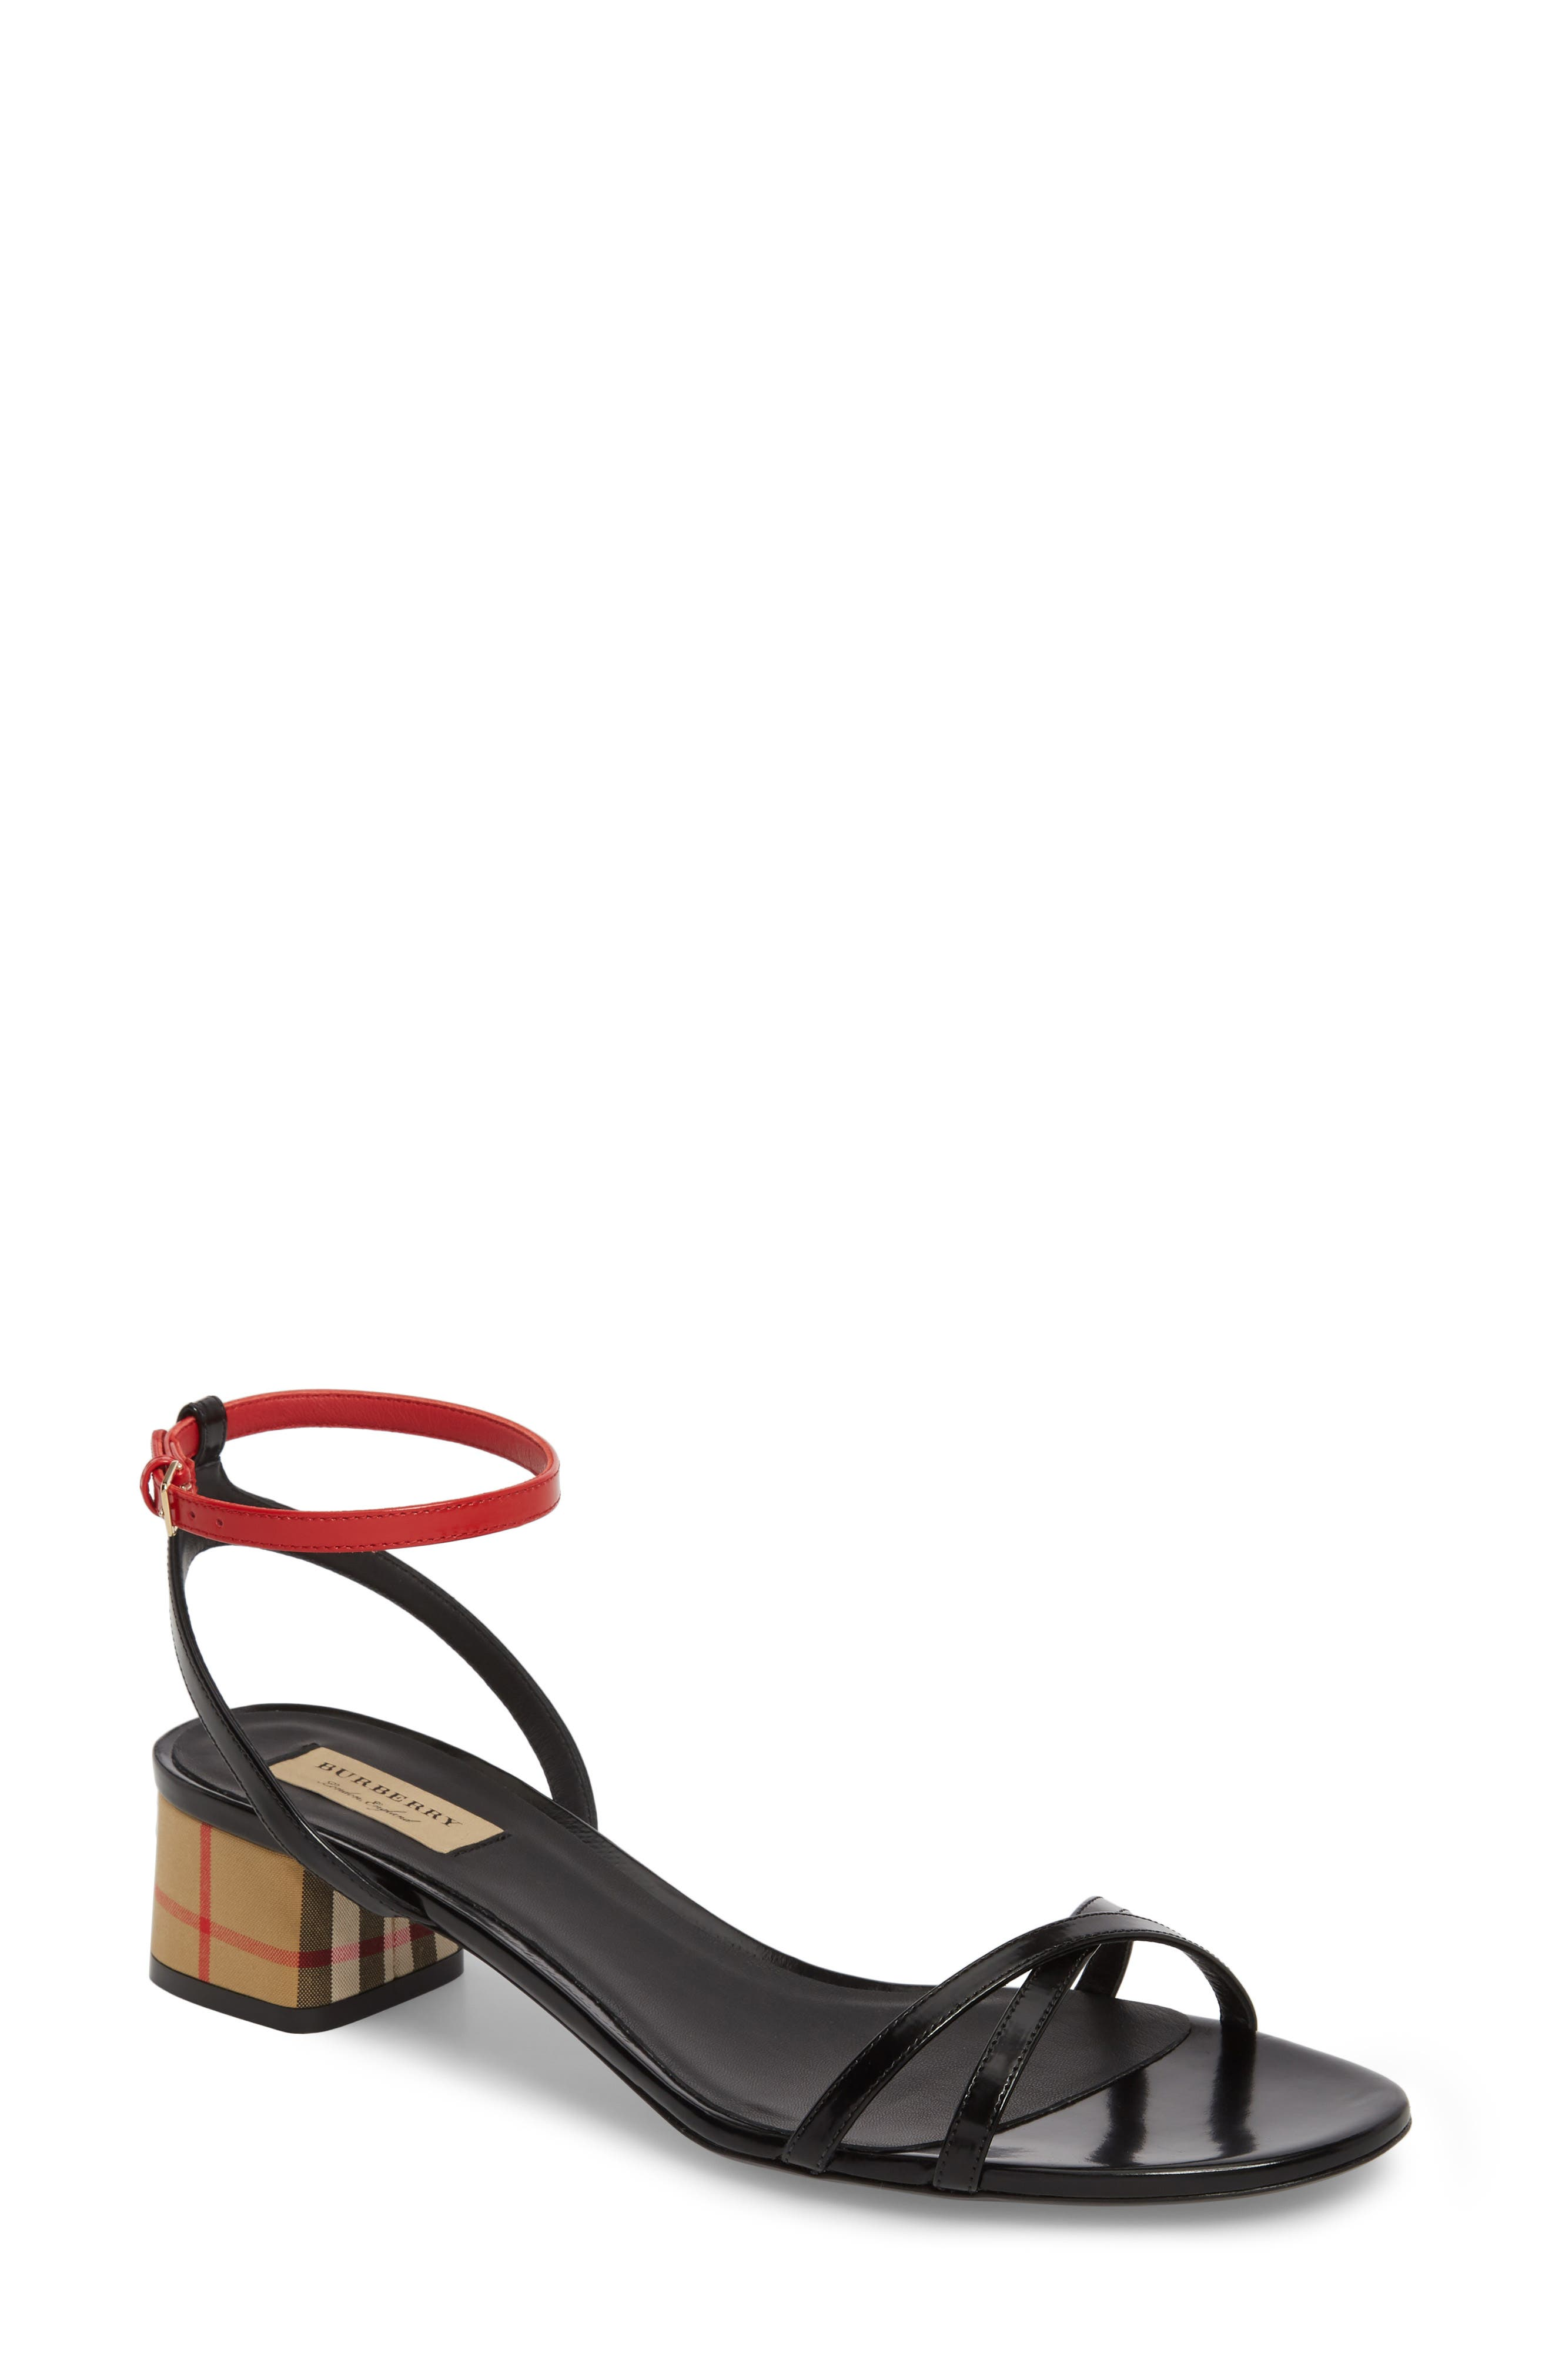 Anthea Check Ankle Strap Sandal,                         Main,                         color, Black